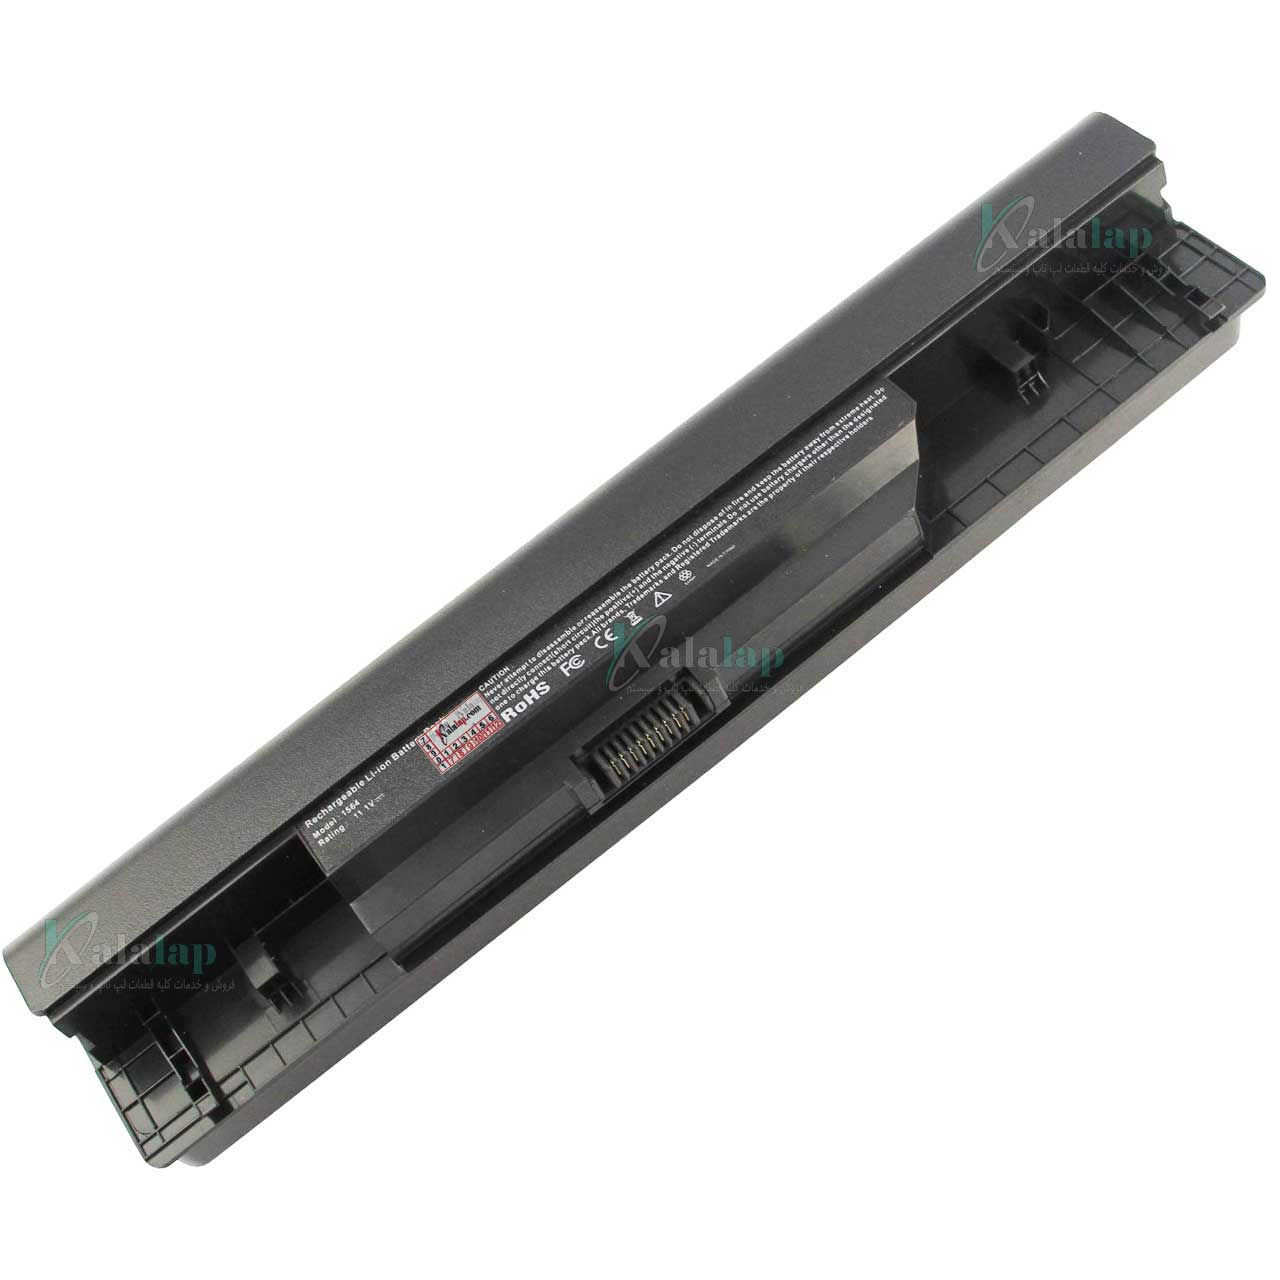 خرید باتری لپ تاپ دل Battery Laptop Dell 1564-9Cell